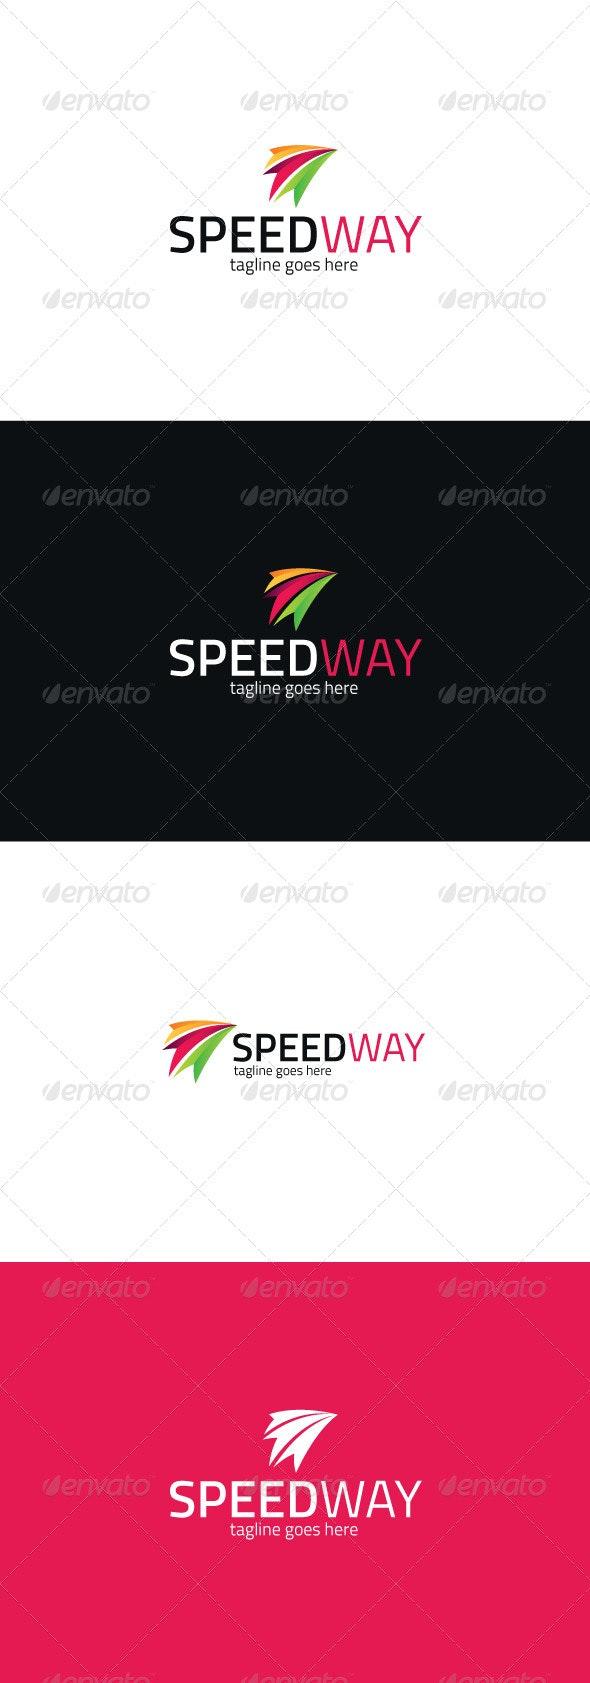 Speed Way Logo - Vector Abstract